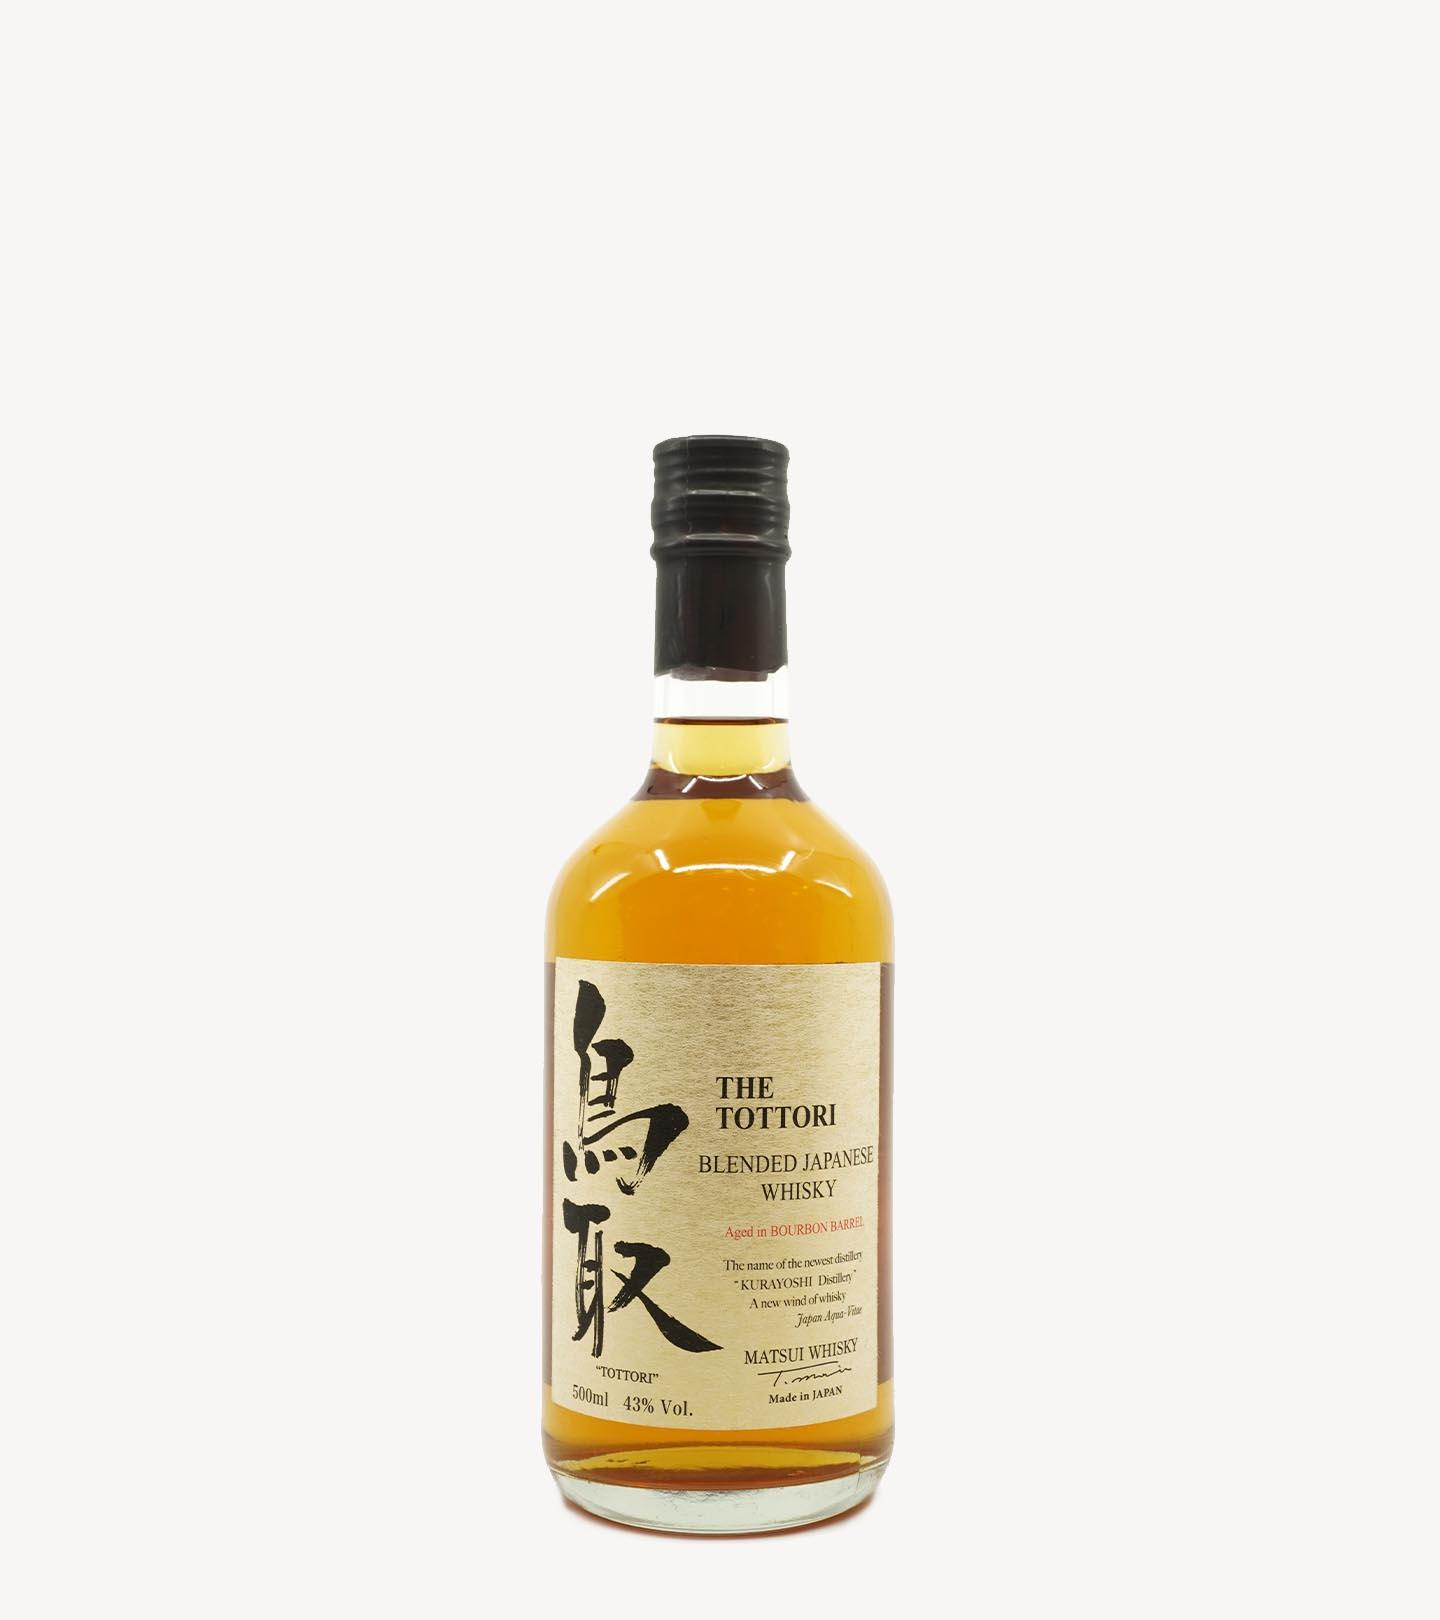 Whisky The Tottori Bourbon Barrel 50cl